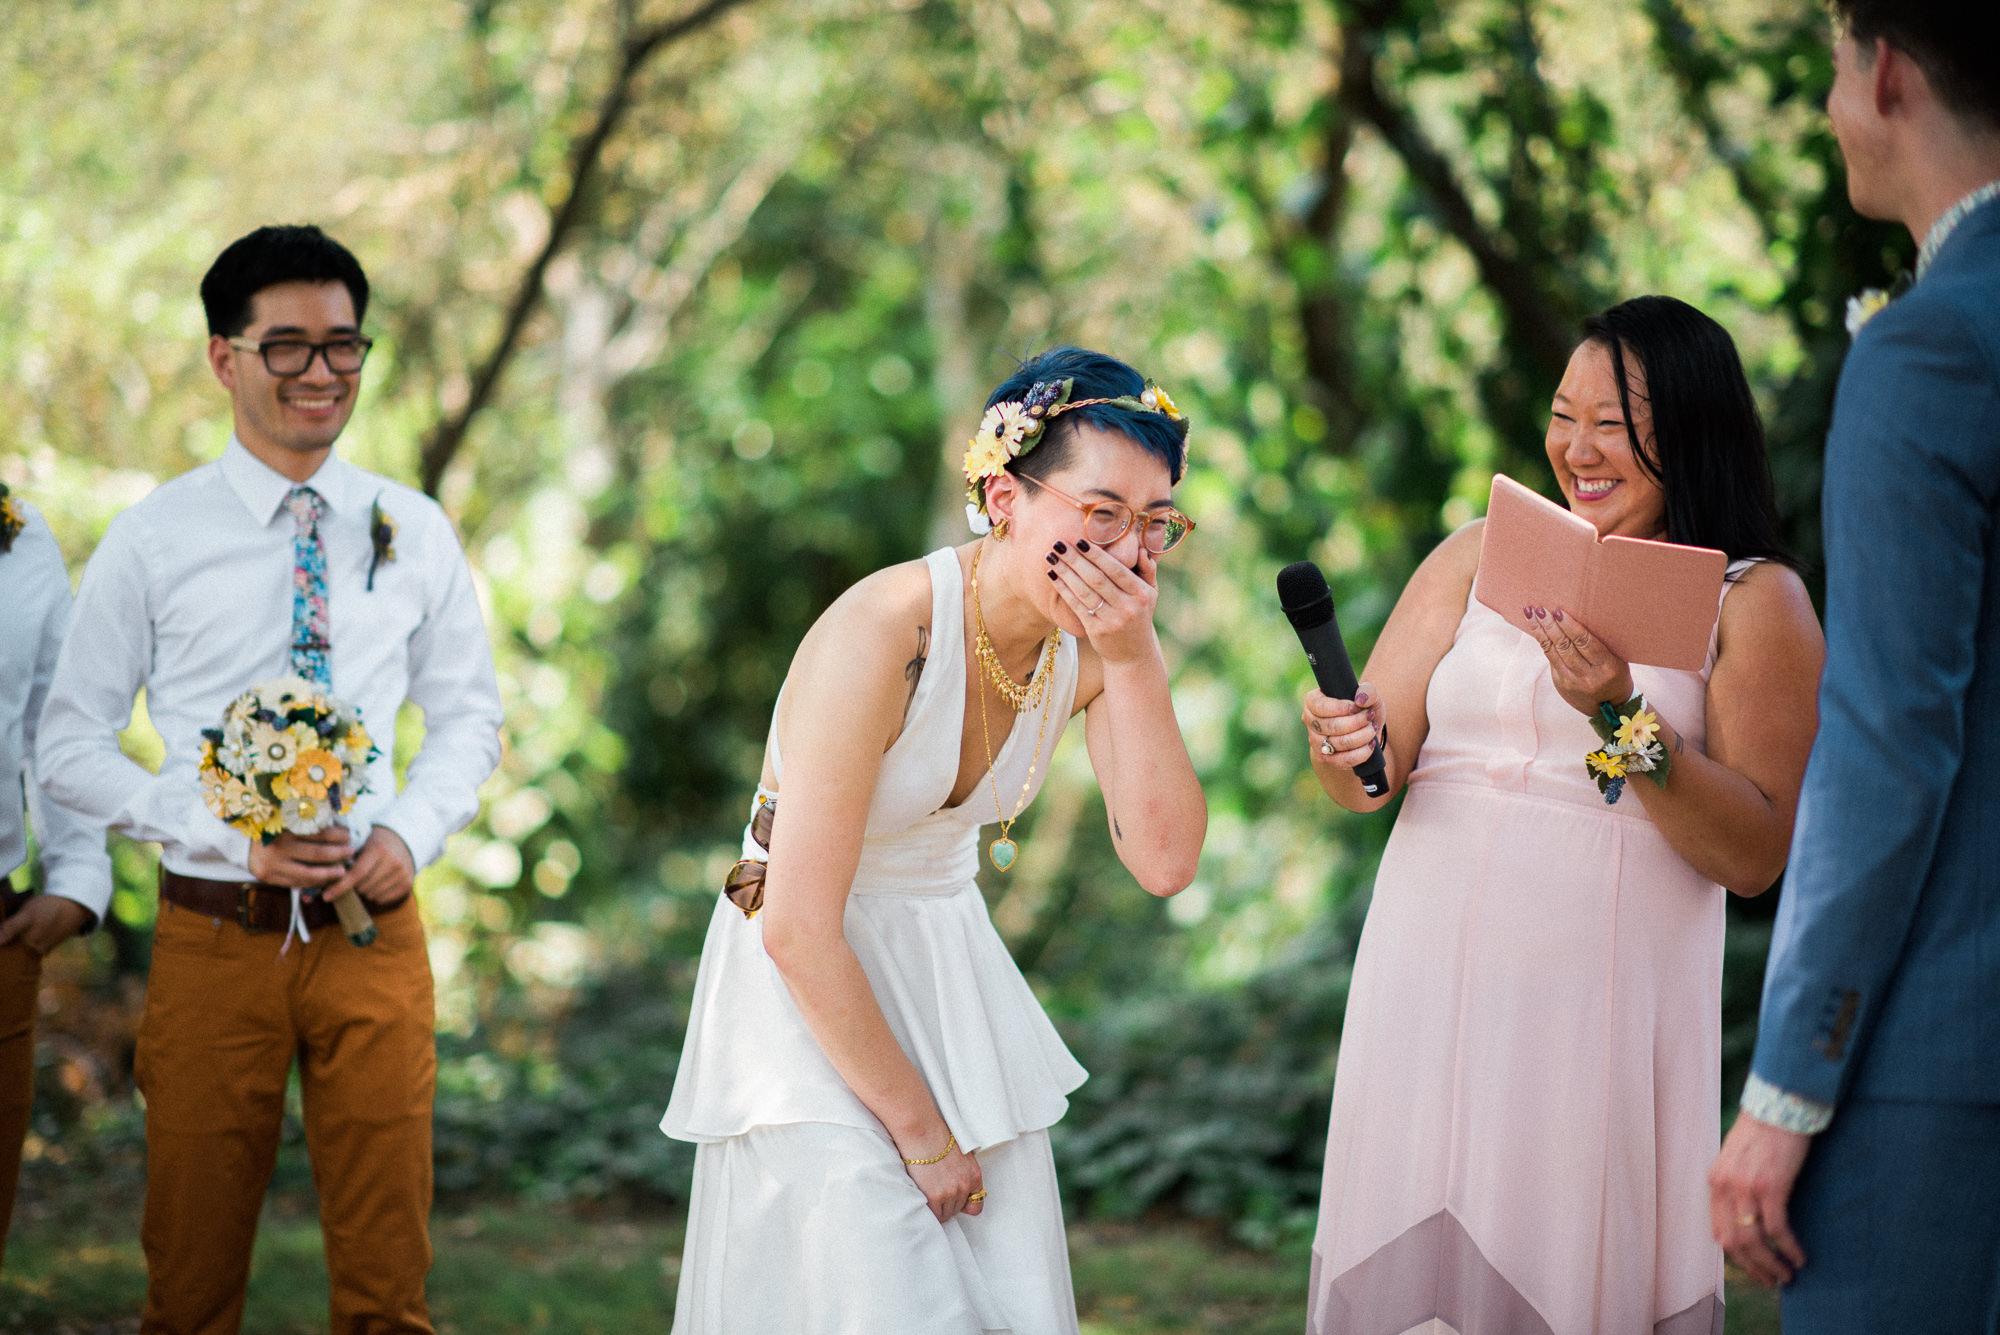 Monte Rio Community Center Wedding 036.jpg